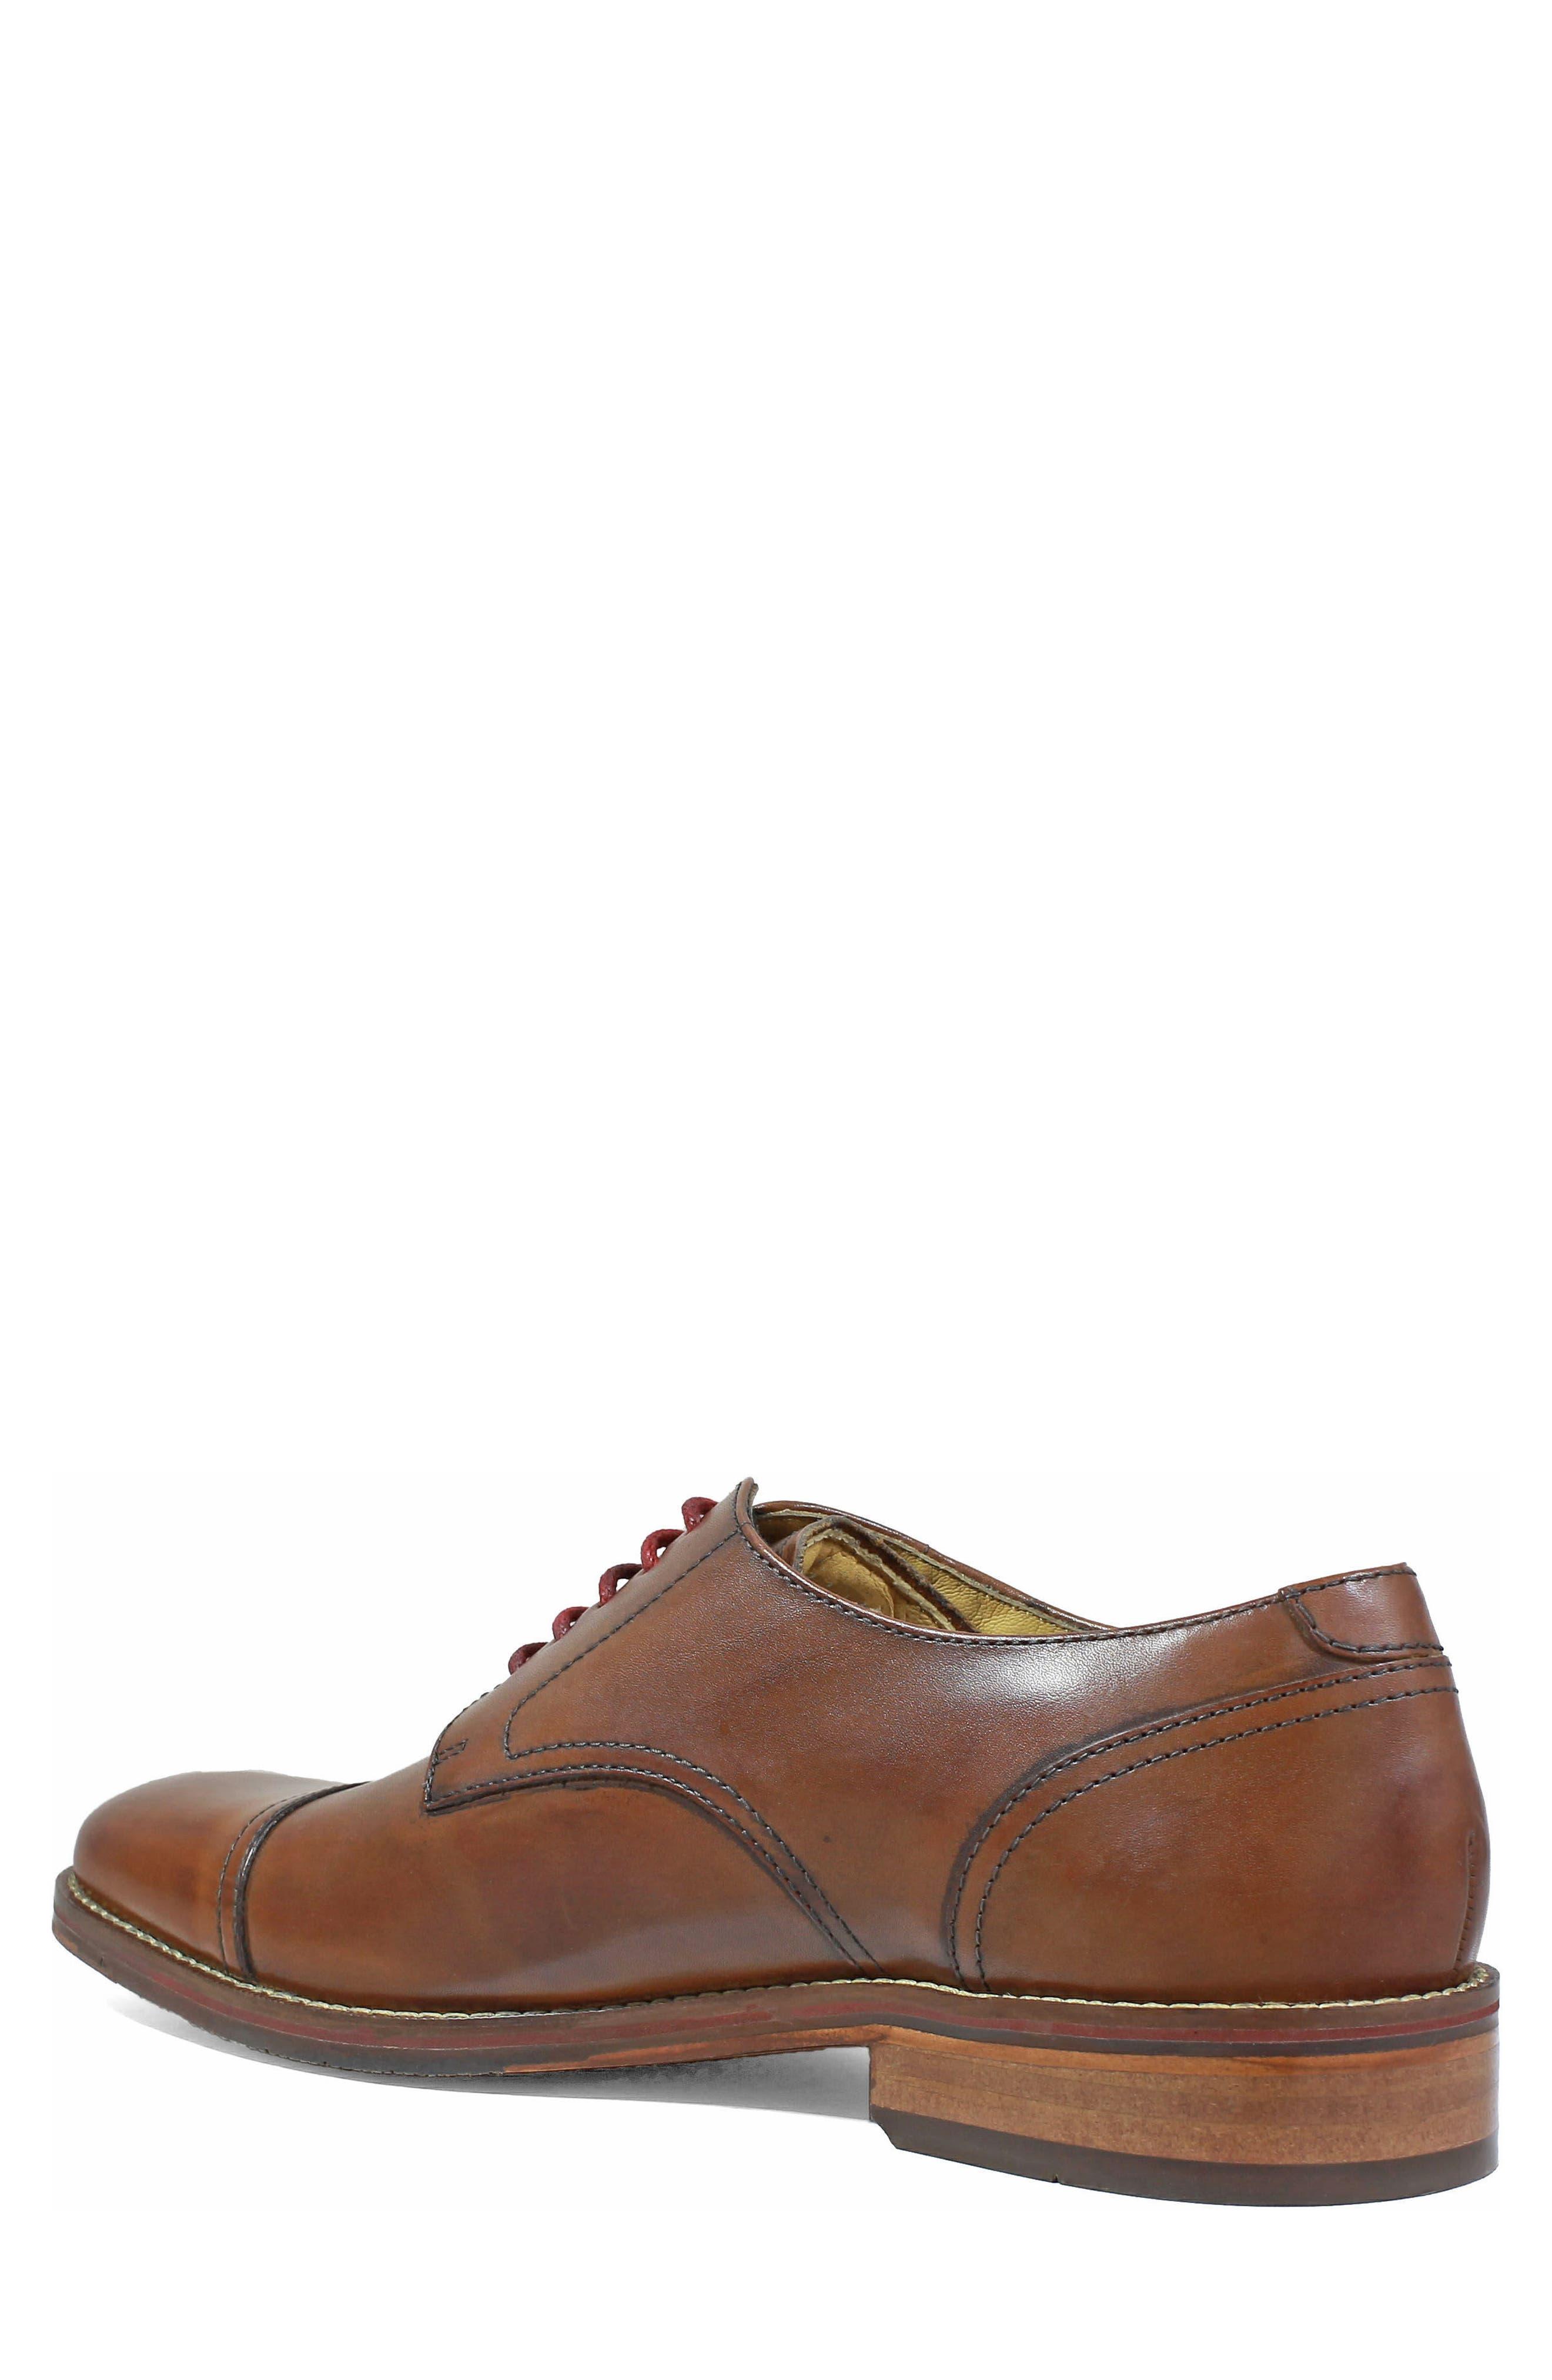 Salerno Wingtip,                             Alternate thumbnail 2, color,                             Cognac Leather